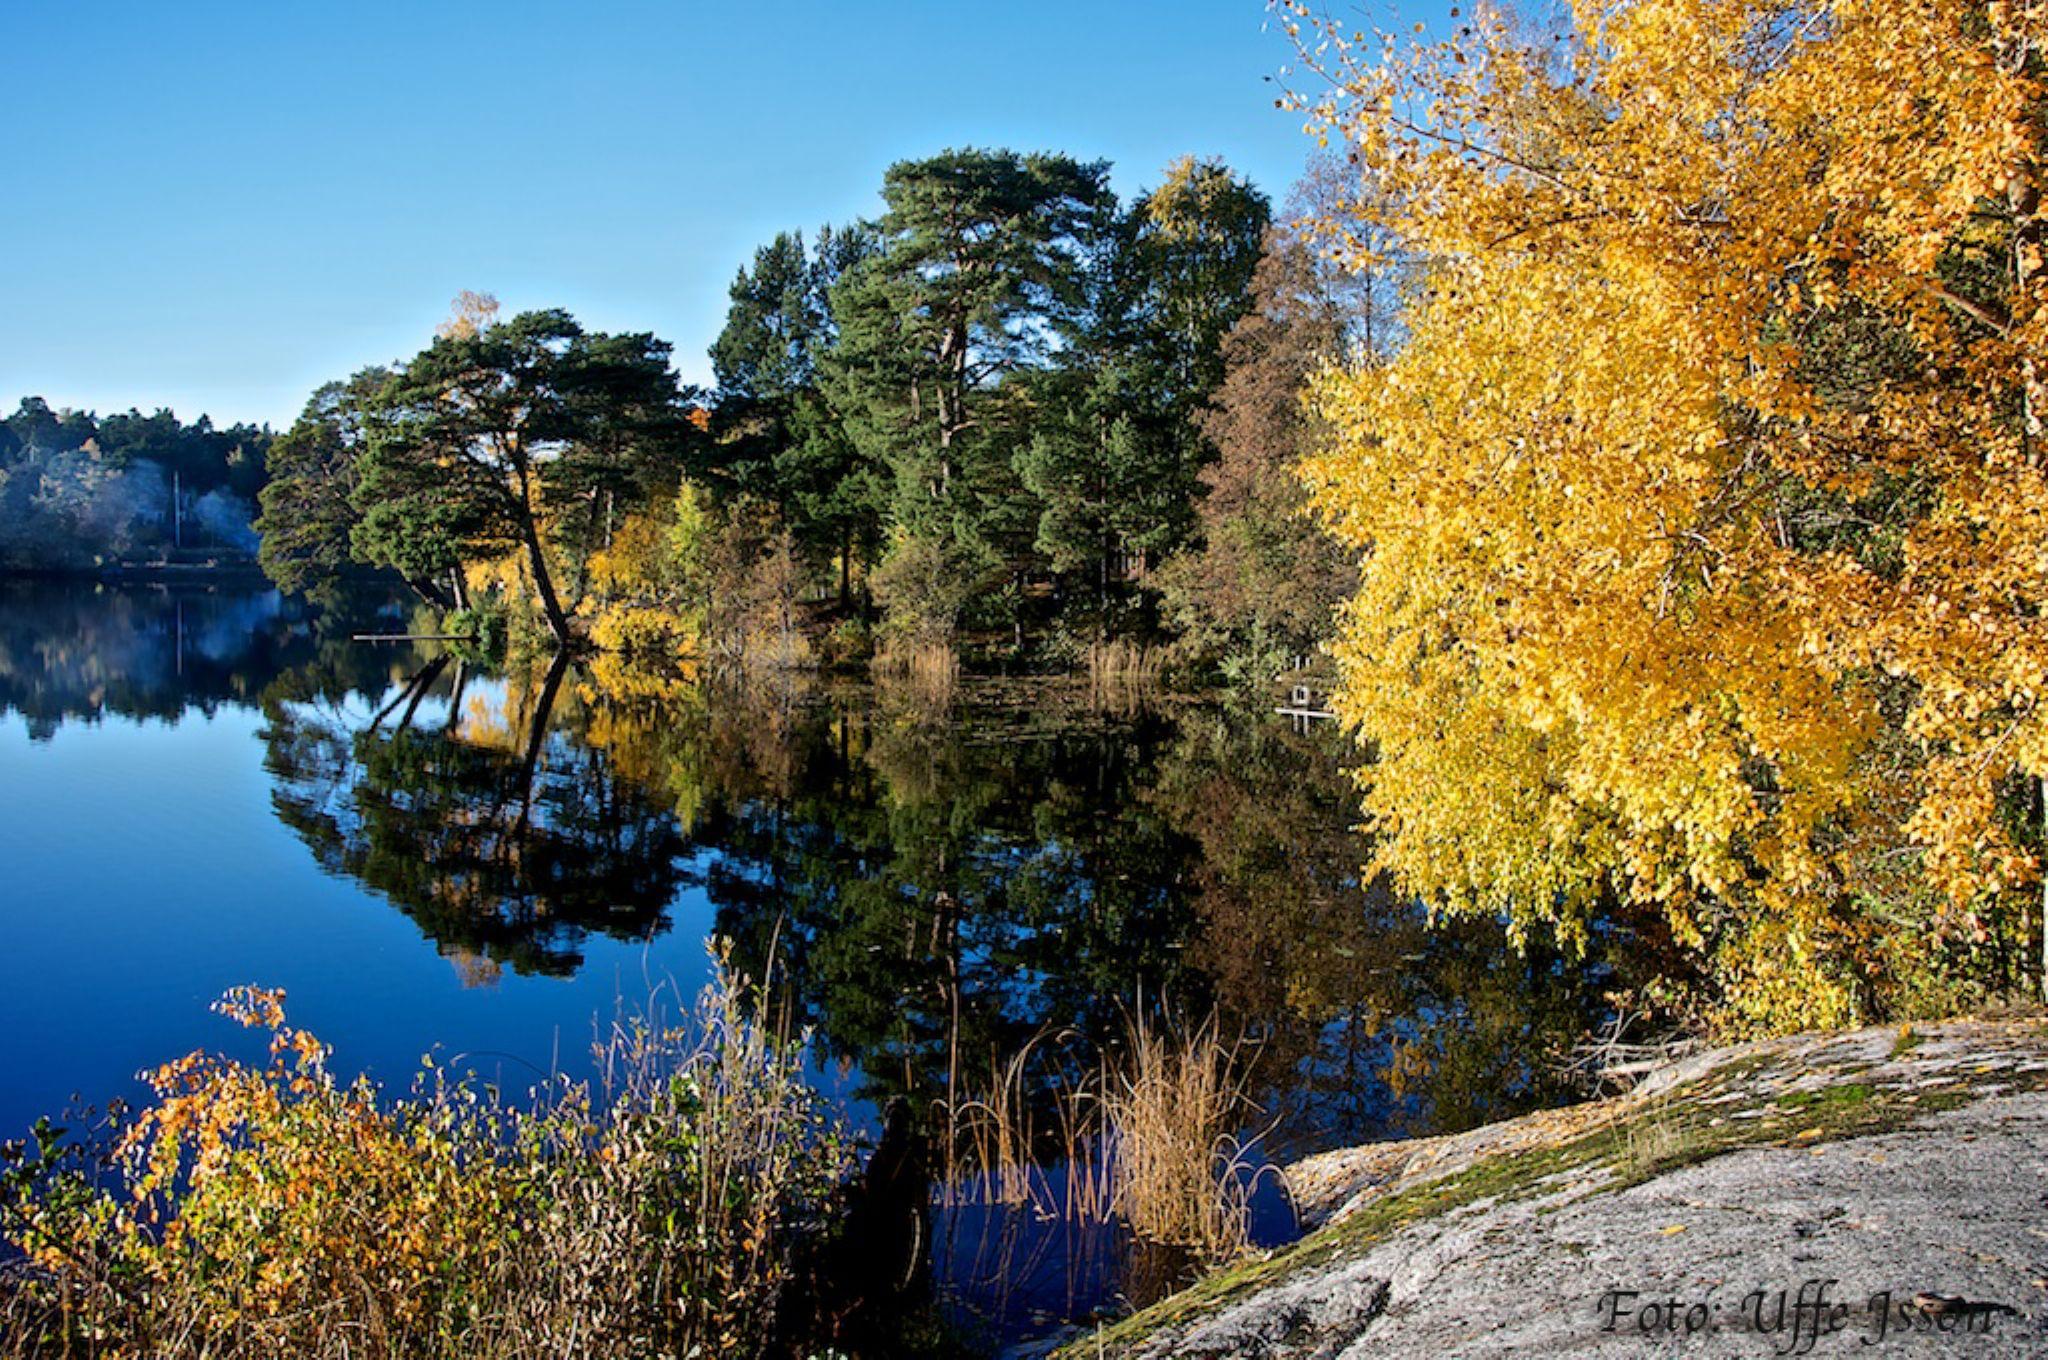 autumn by uffejsson